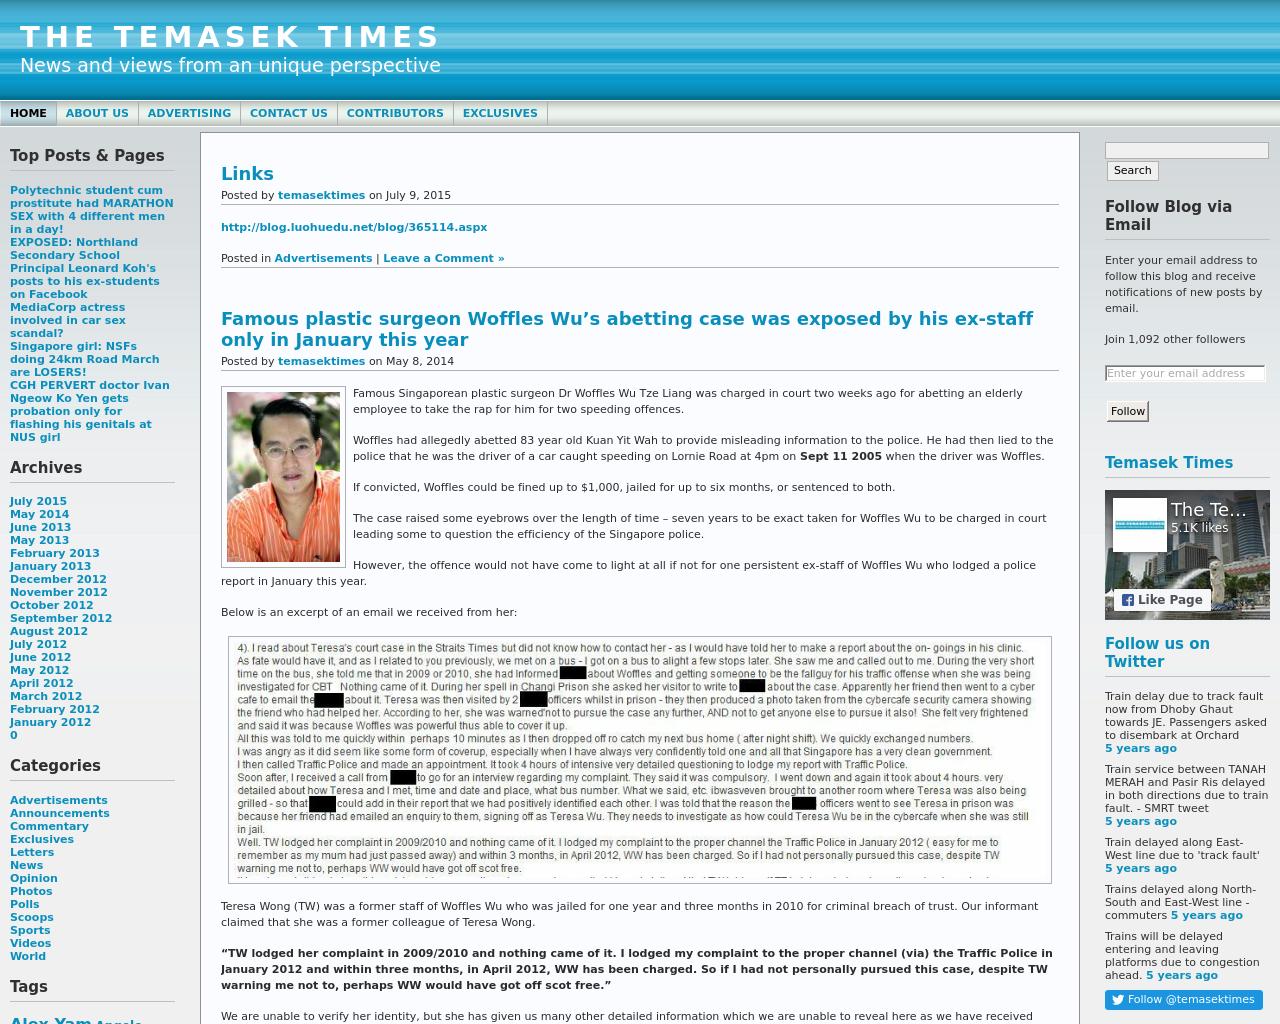 THE-TEMASEK-TIMES-Advertising-Reviews-Pricing